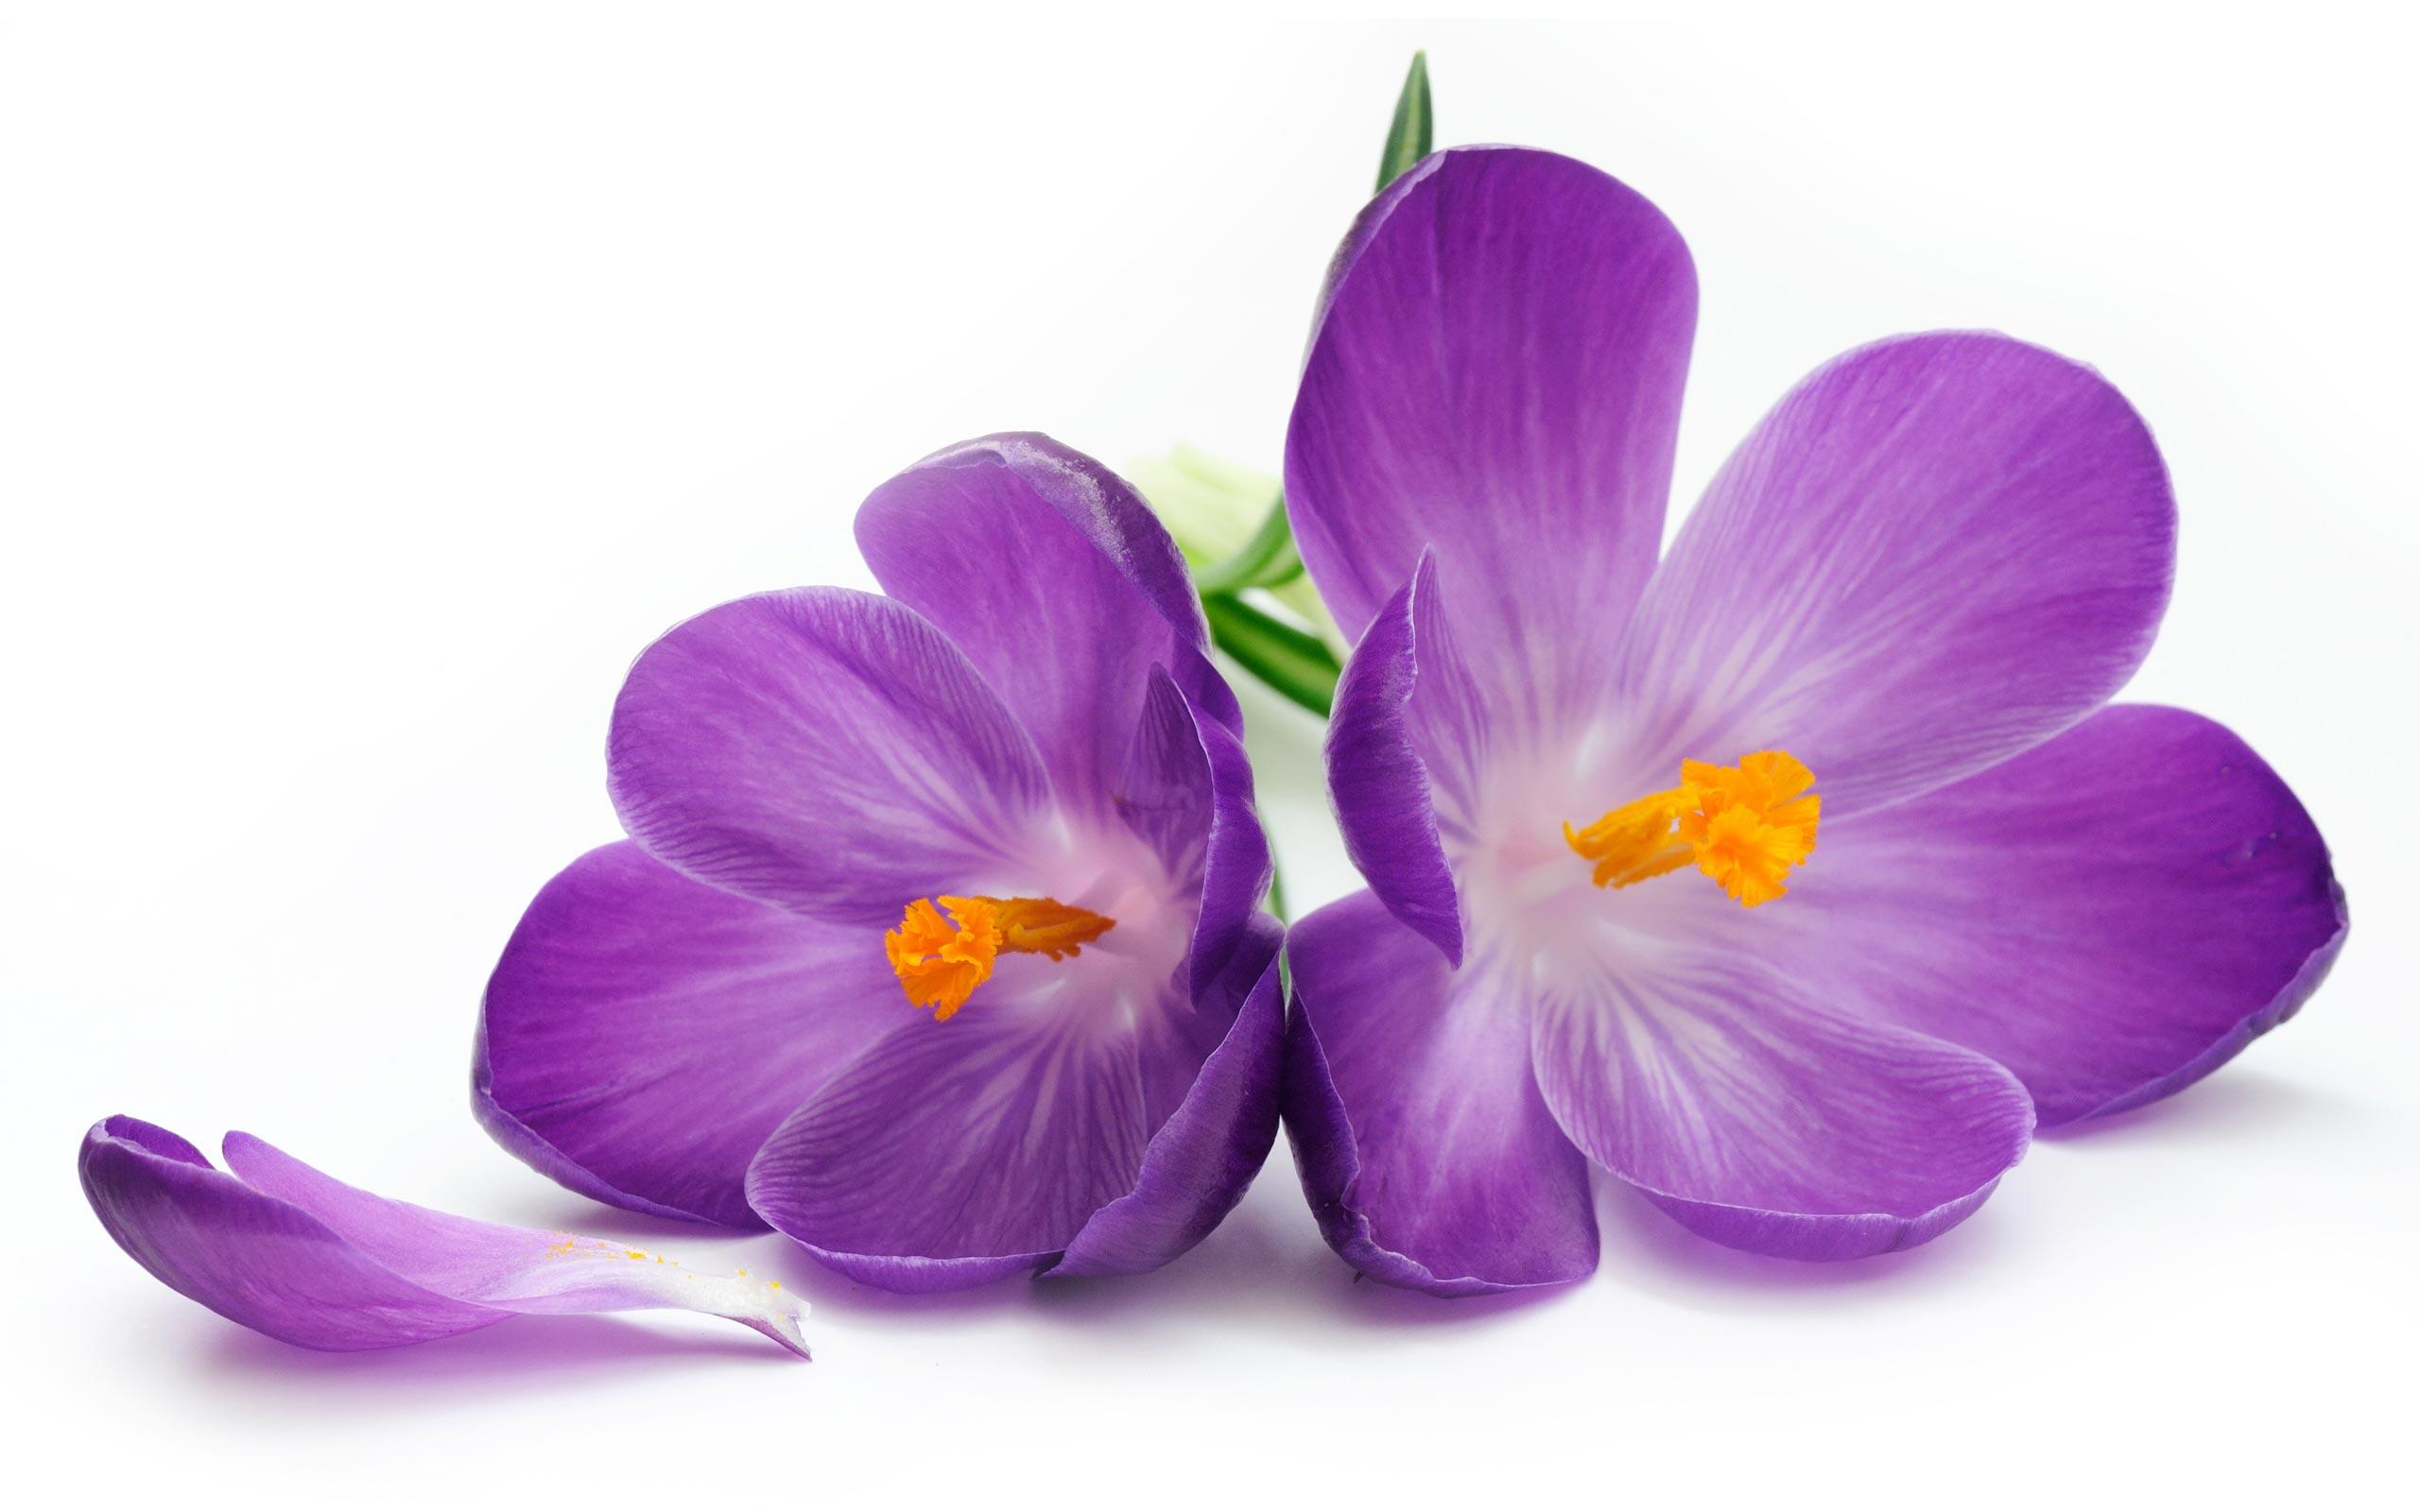 Purple Flower Photos 07179 - Baltana